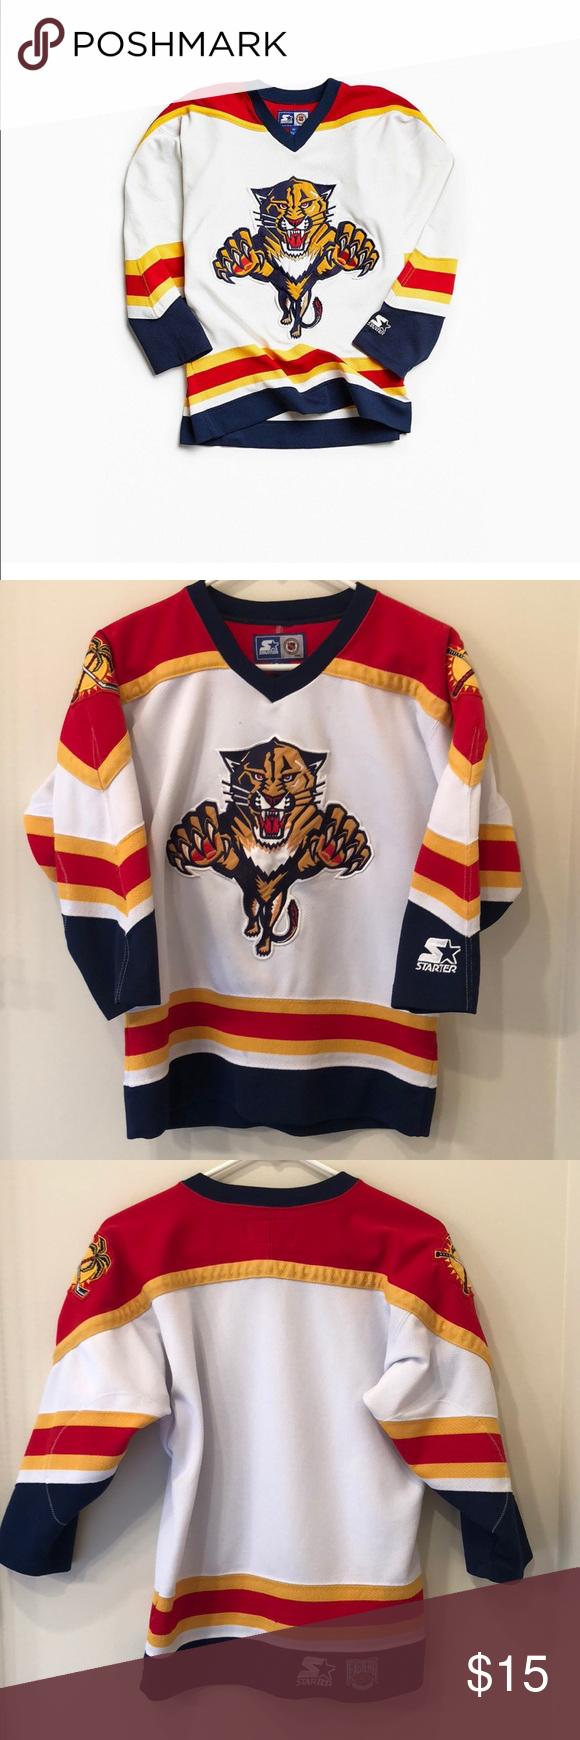 Vintage Nhl Florida Panthers Hockey Jersey Florida Panthers Florida Panthers Hockey Nhl